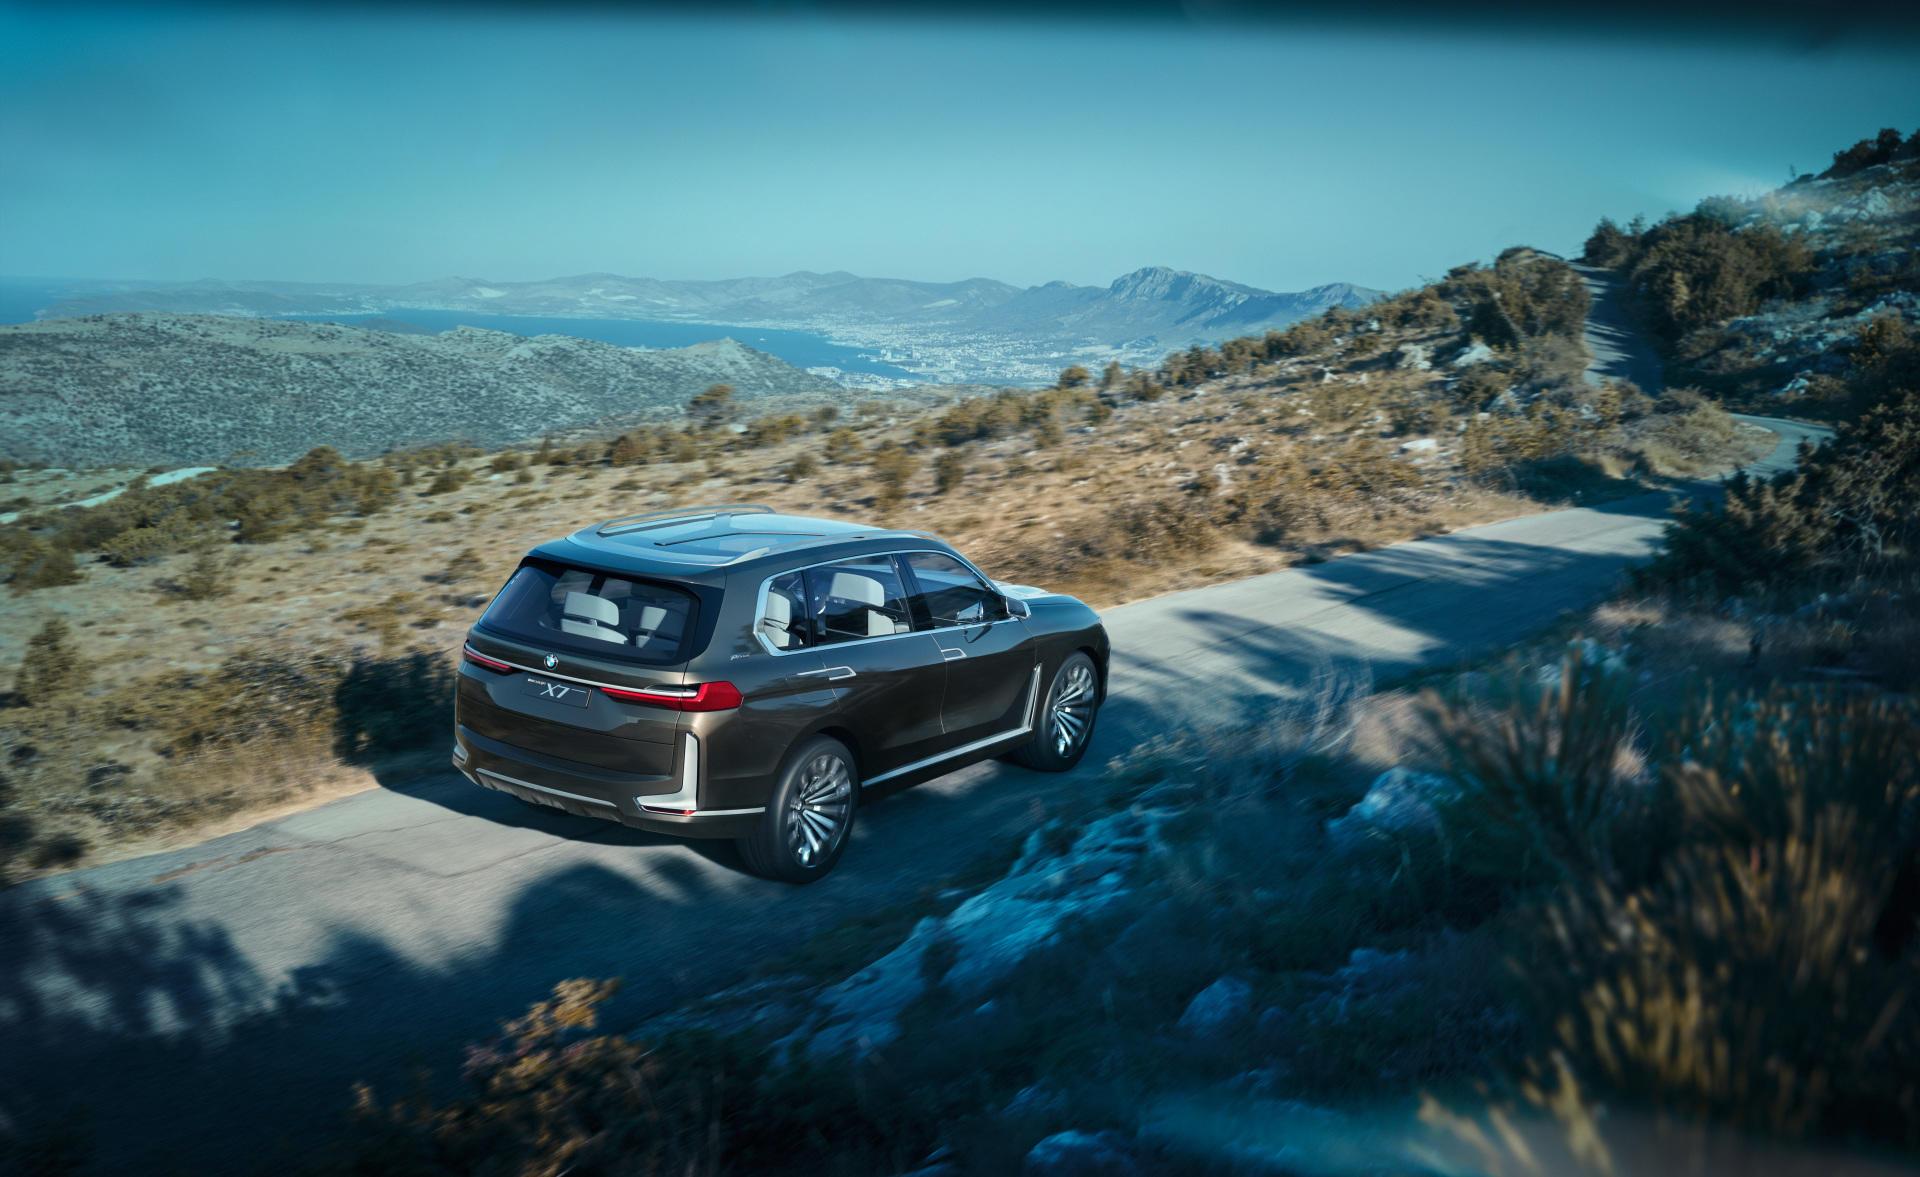 BMW-x7-concept-dm-6.jpg